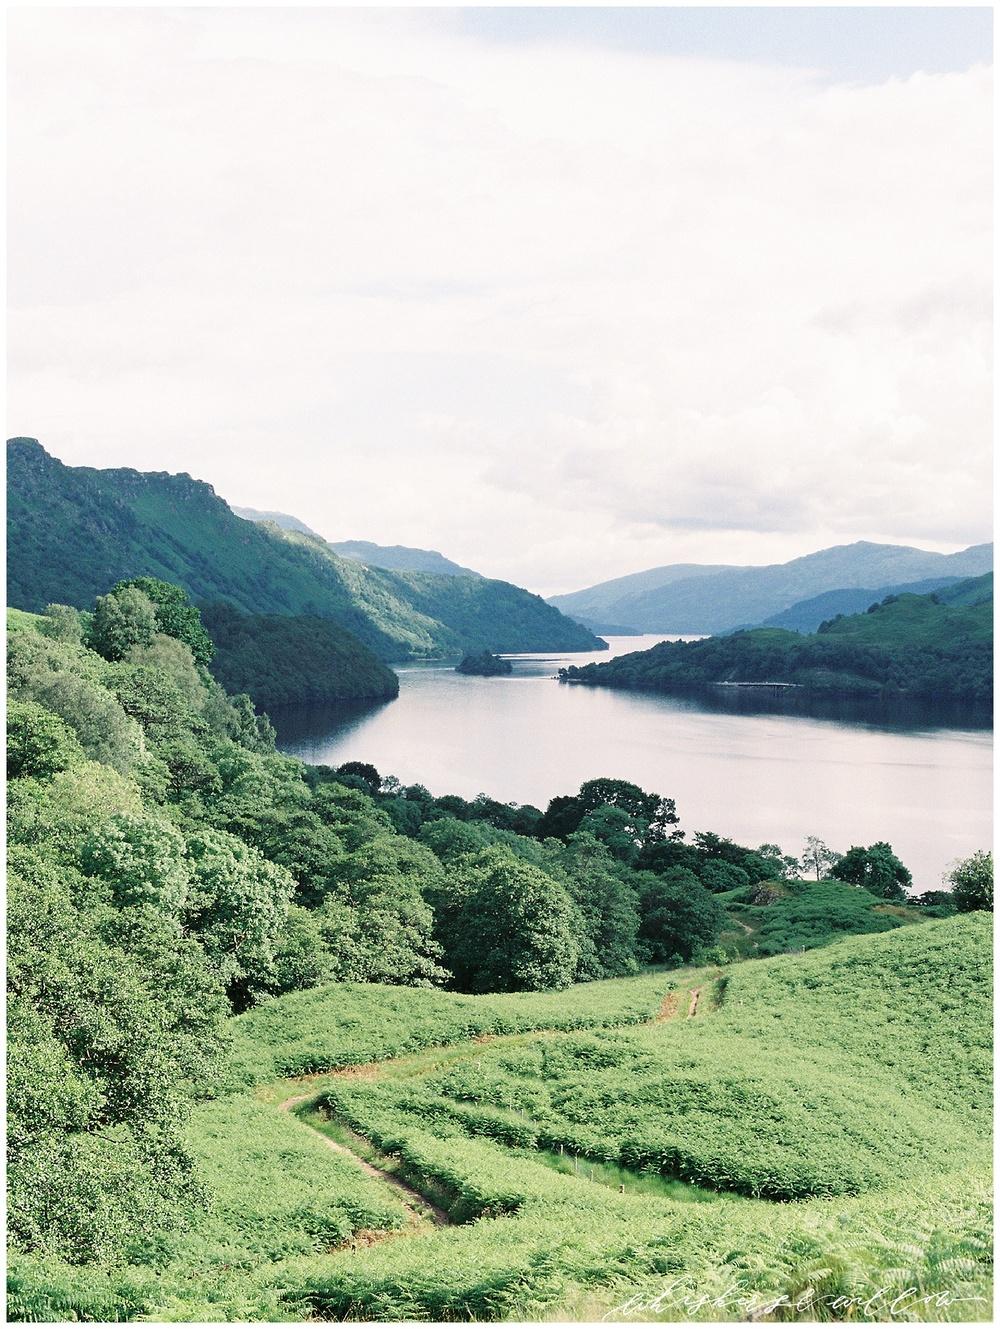 Climbing away from Loch Lomond.